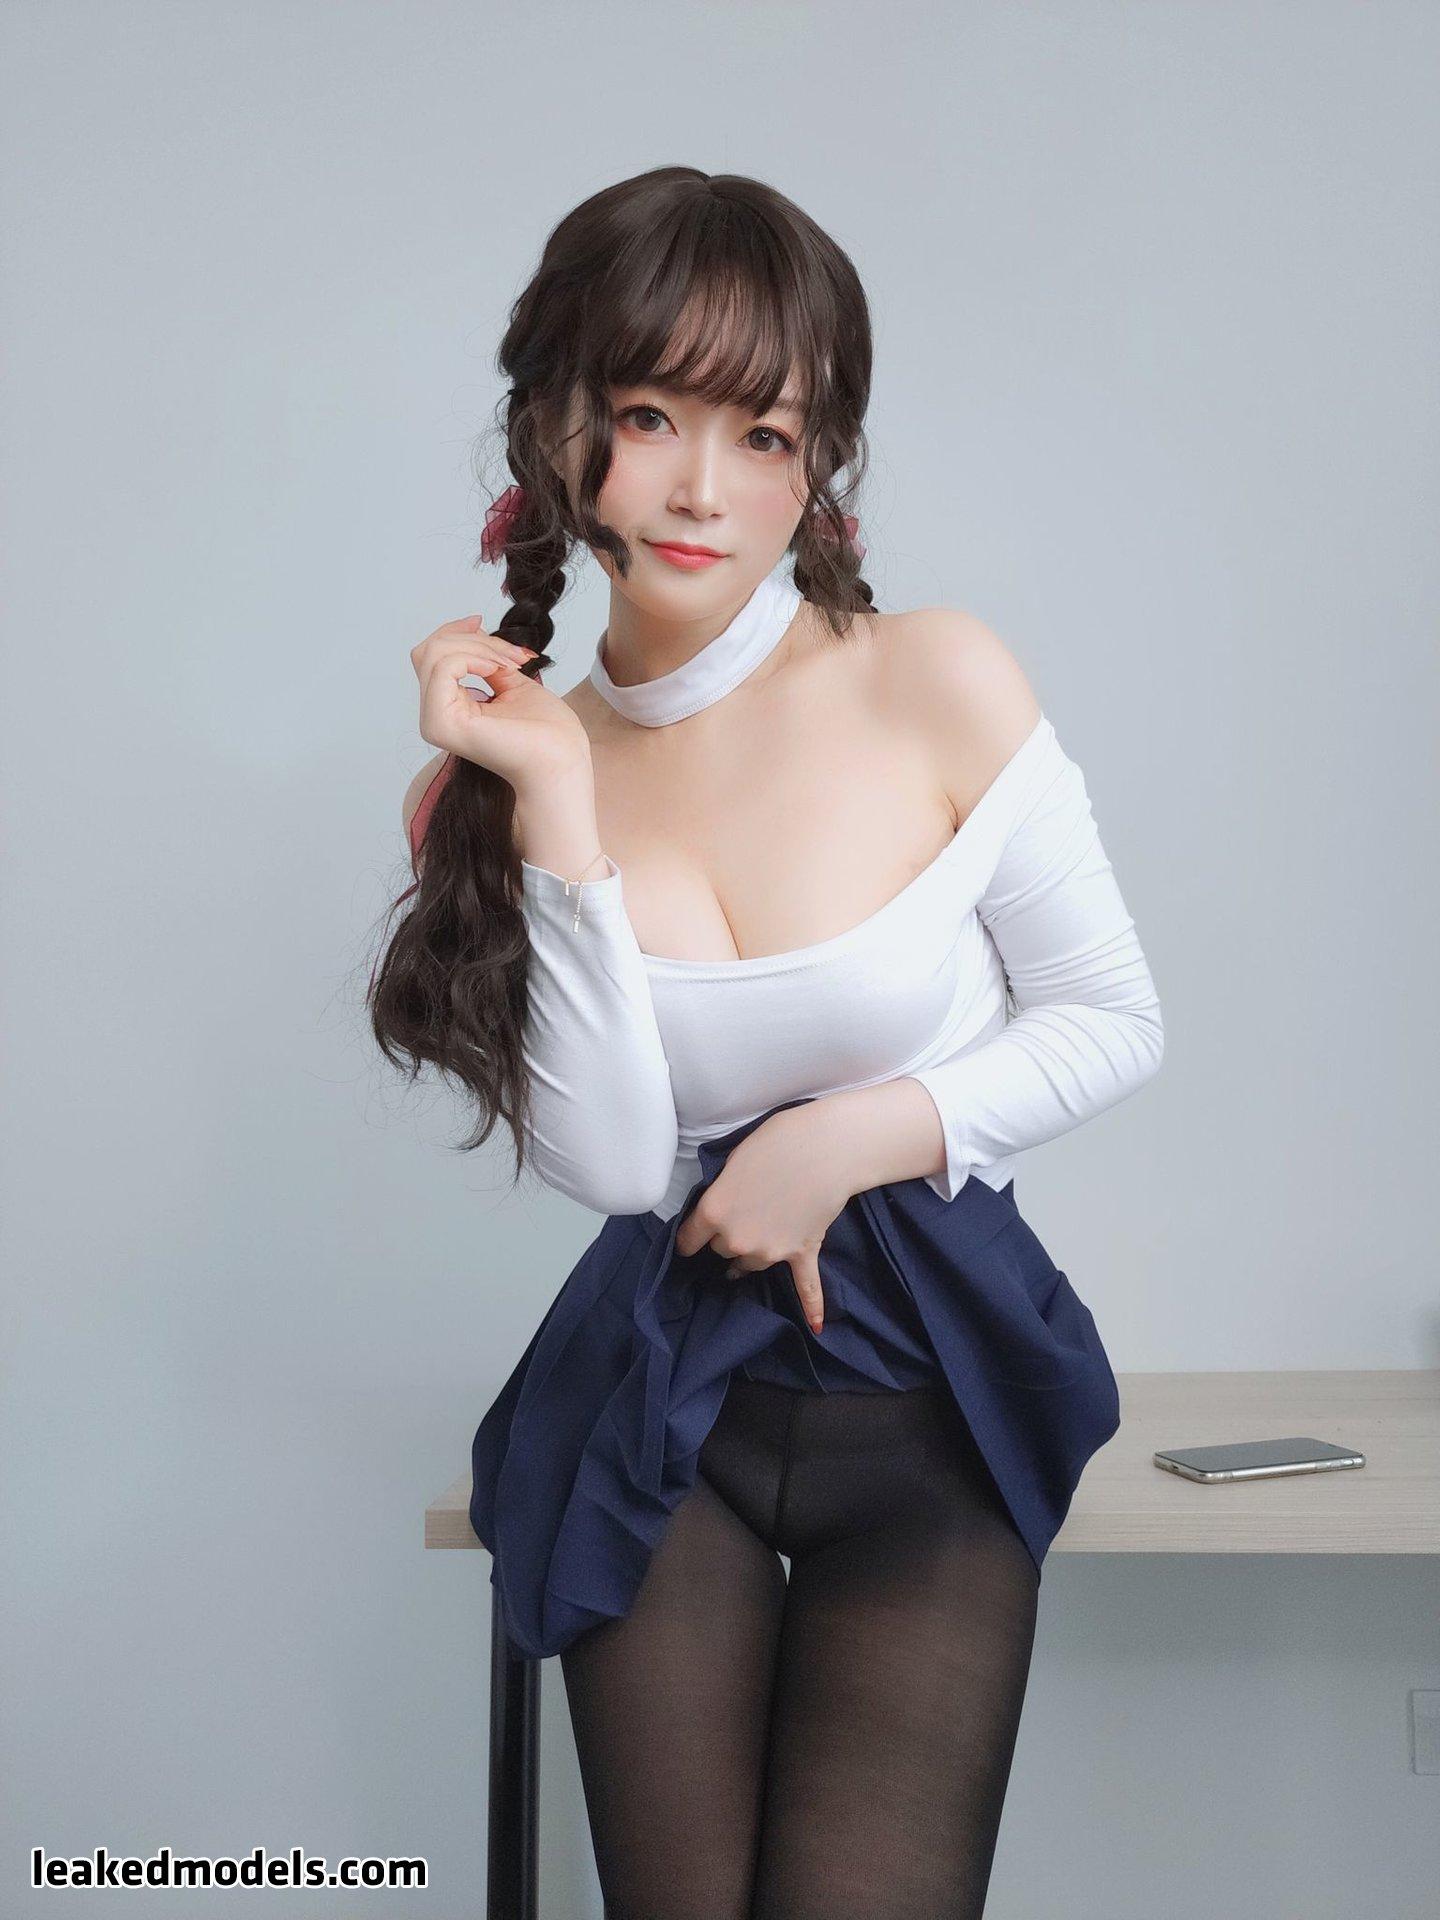 BaiYin – Silver881 OnlyFans Sexy Leaks (25 Photos)